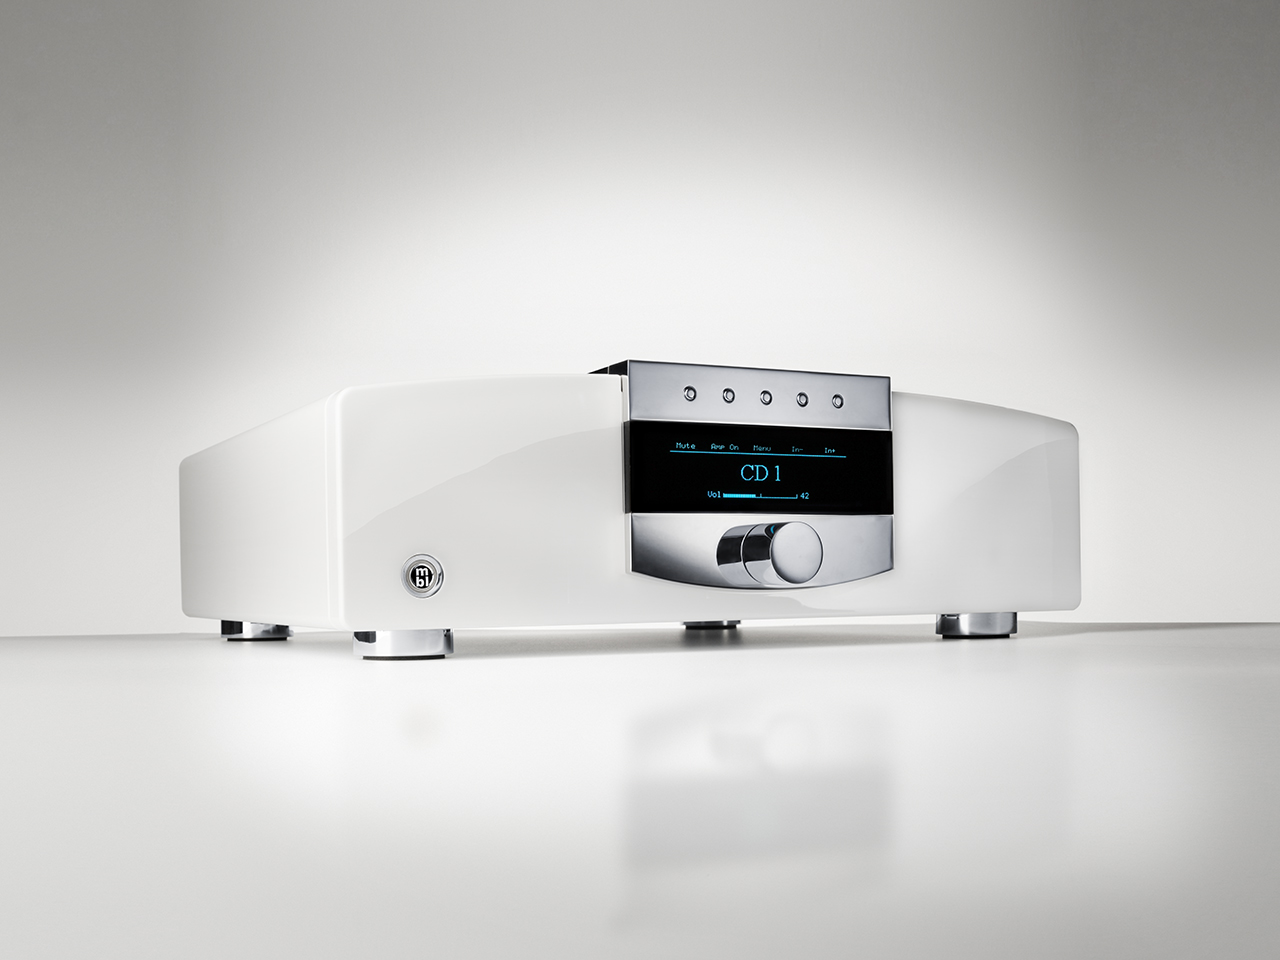 mbl-c51-white